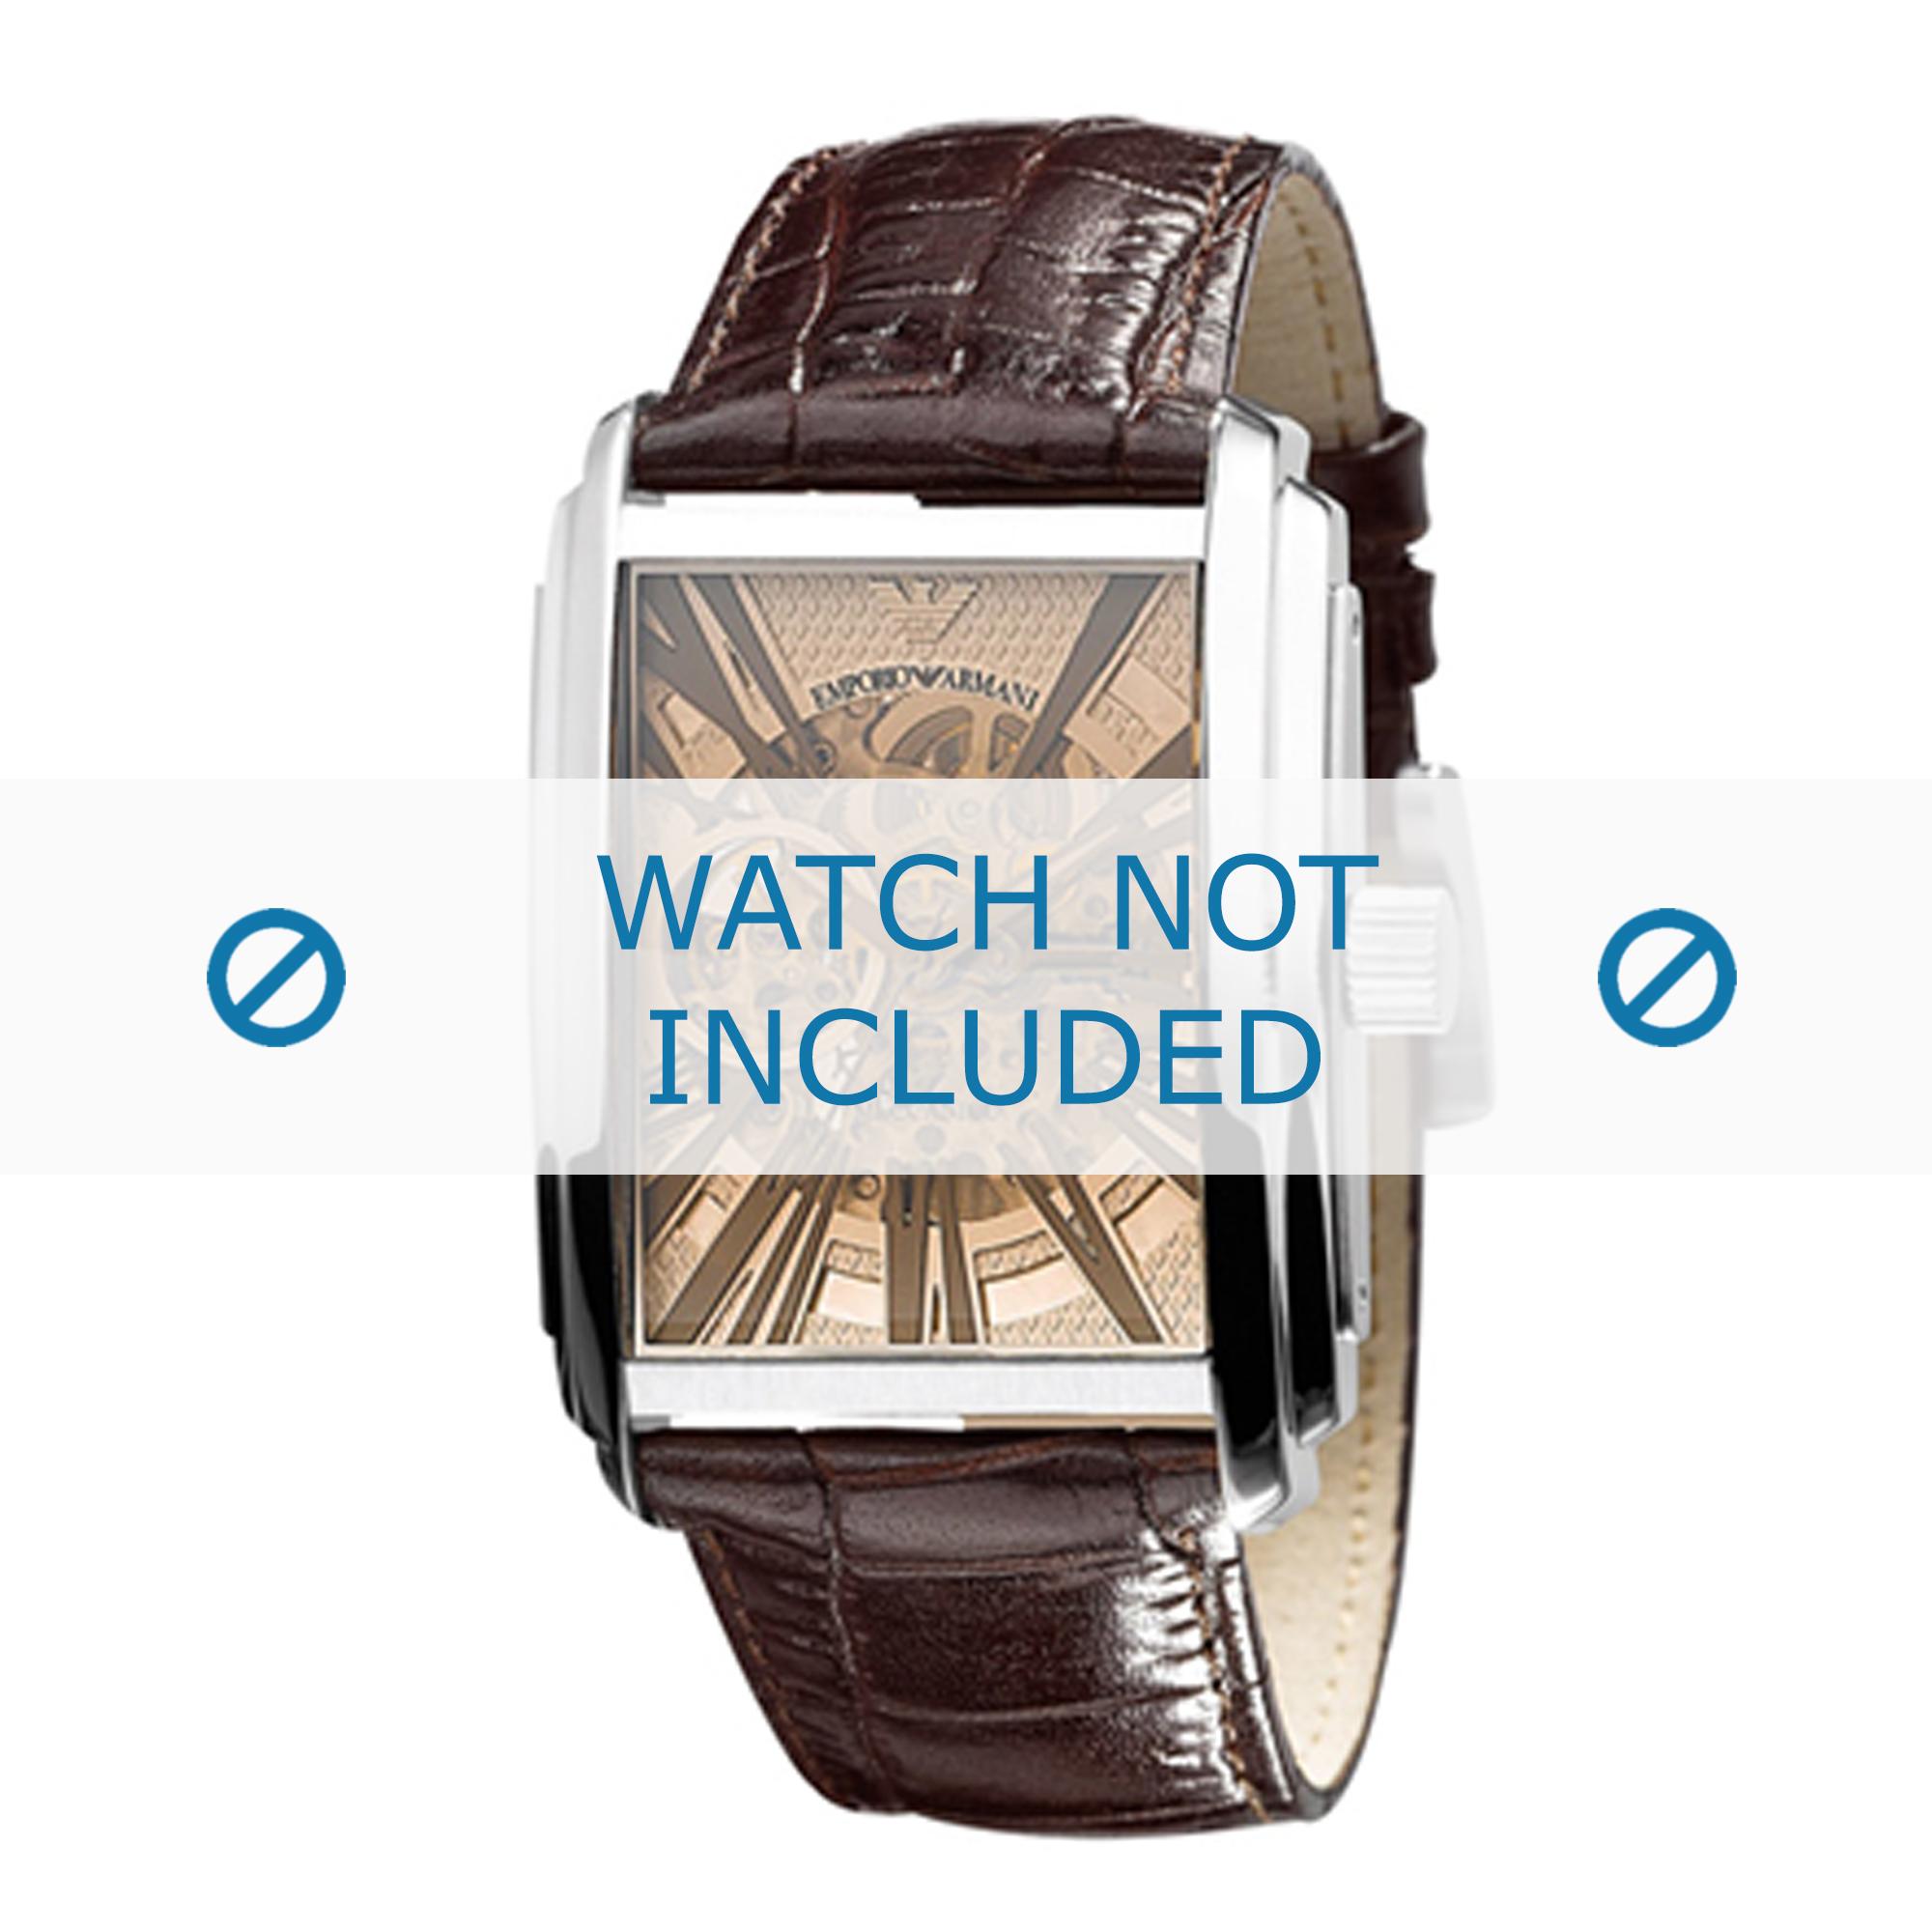 Armani horlogeband AR4230 Leder Bruin 26mm + bruin stiksel